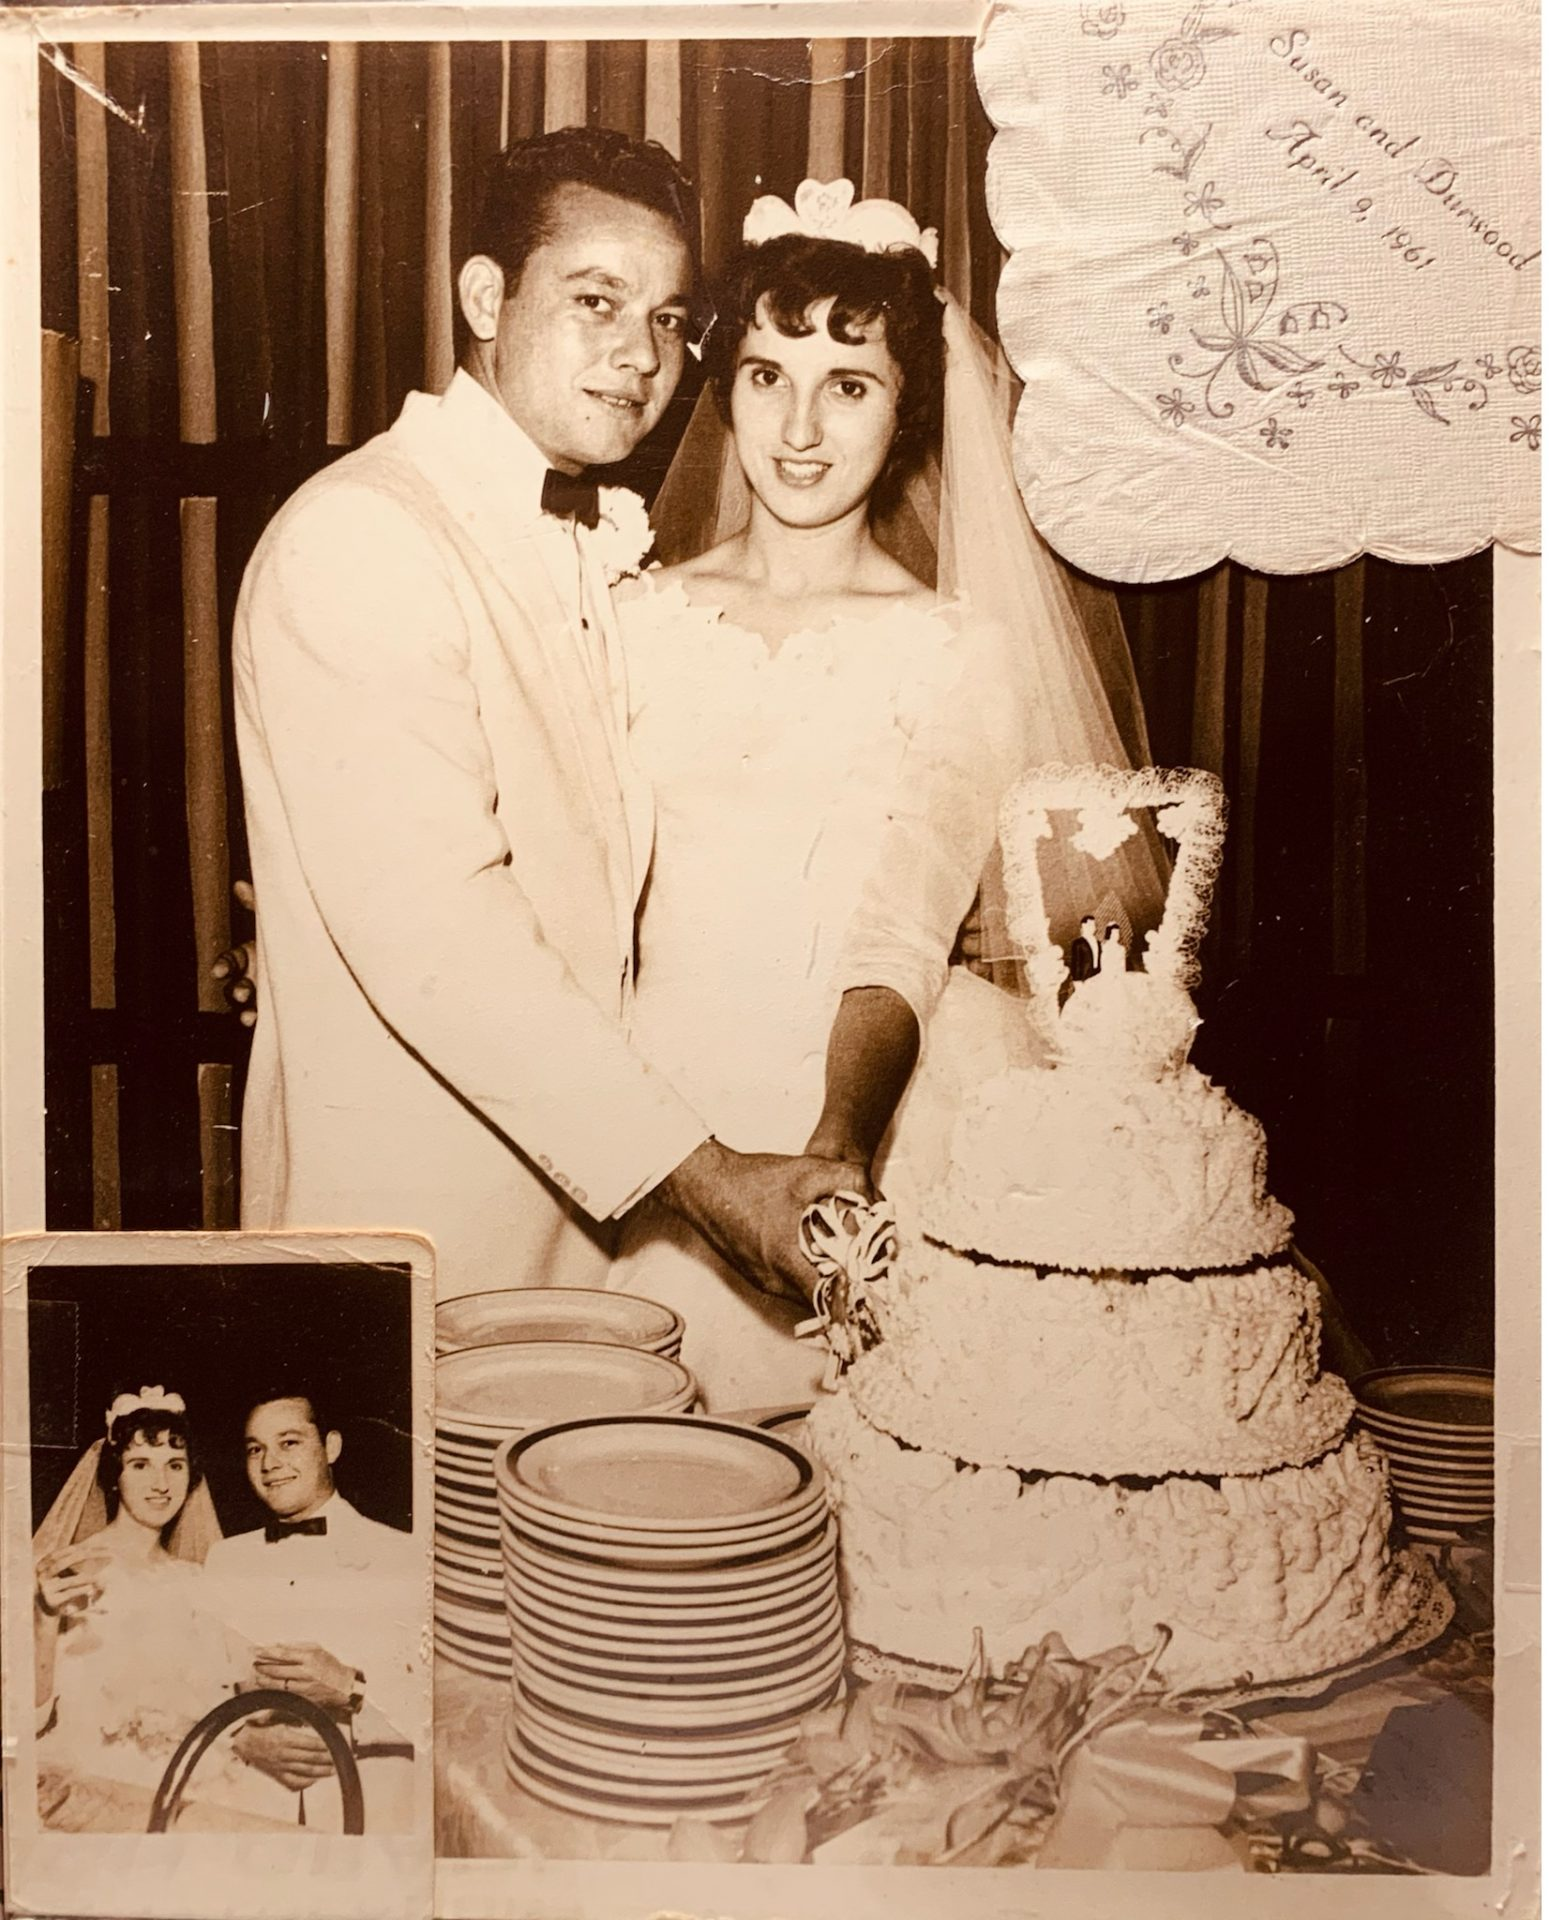 April 9, 1961